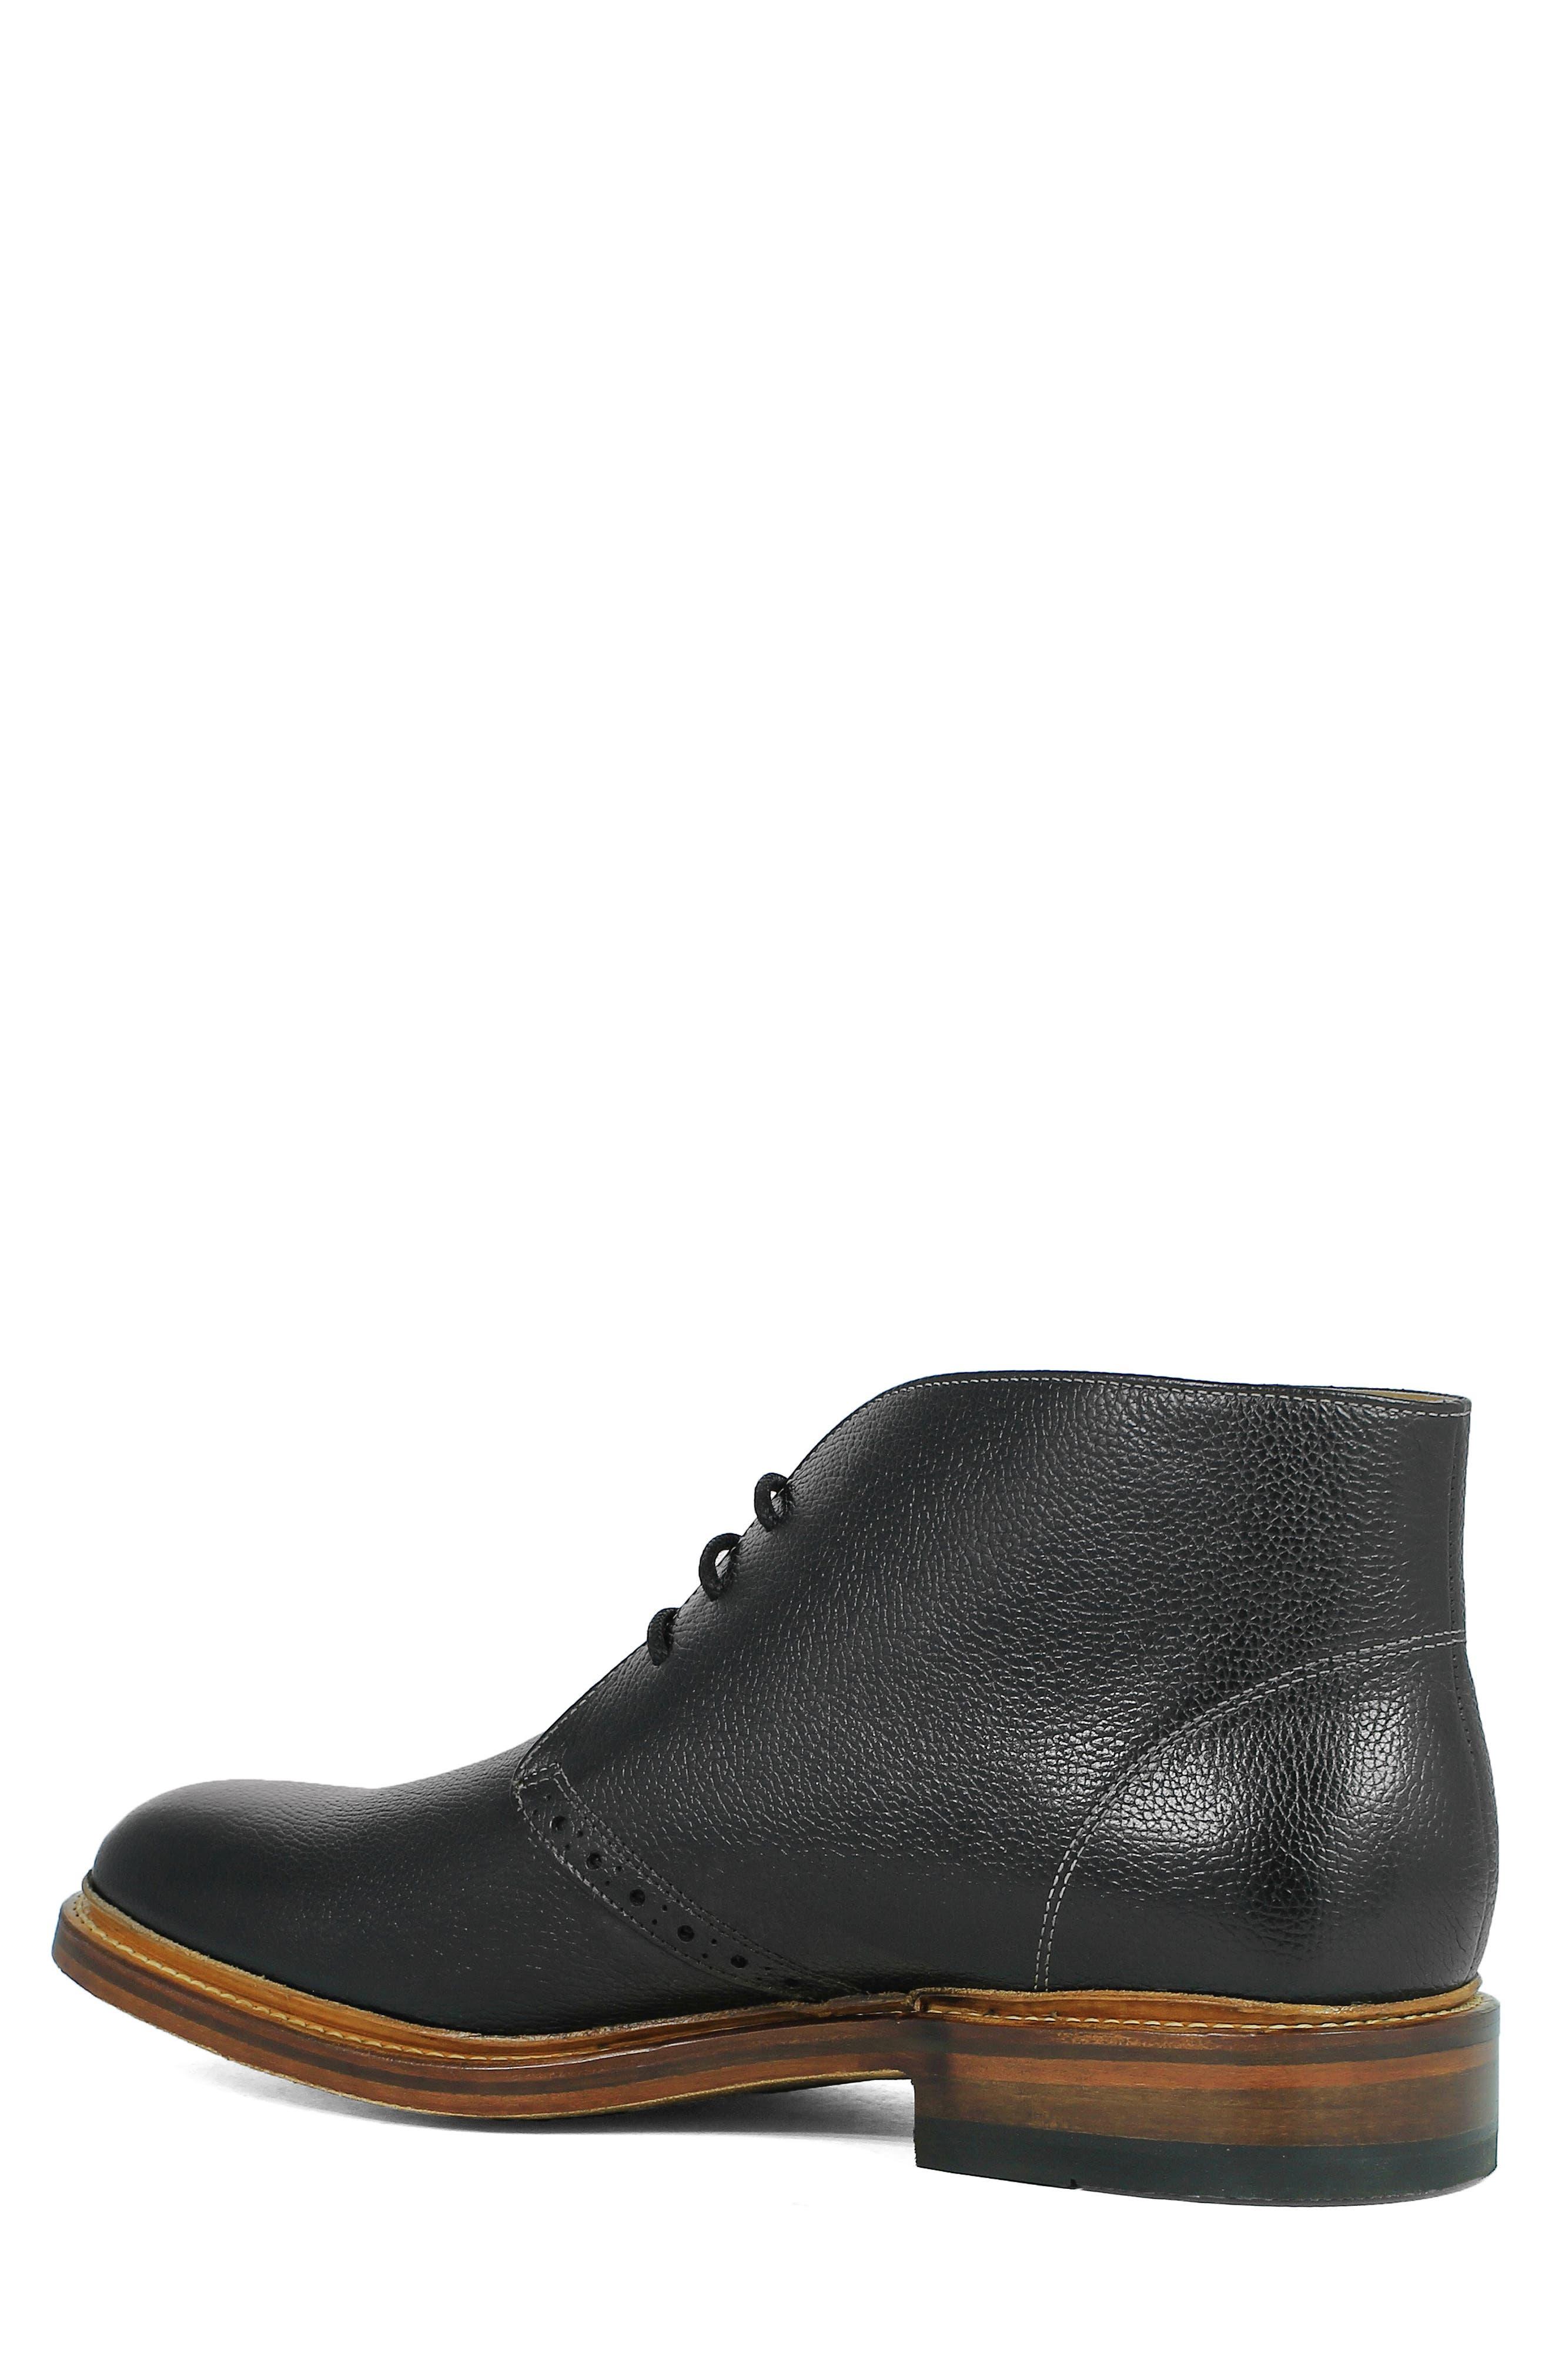 'Madison II' Chukka Boot,                             Alternate thumbnail 2, color,                             001